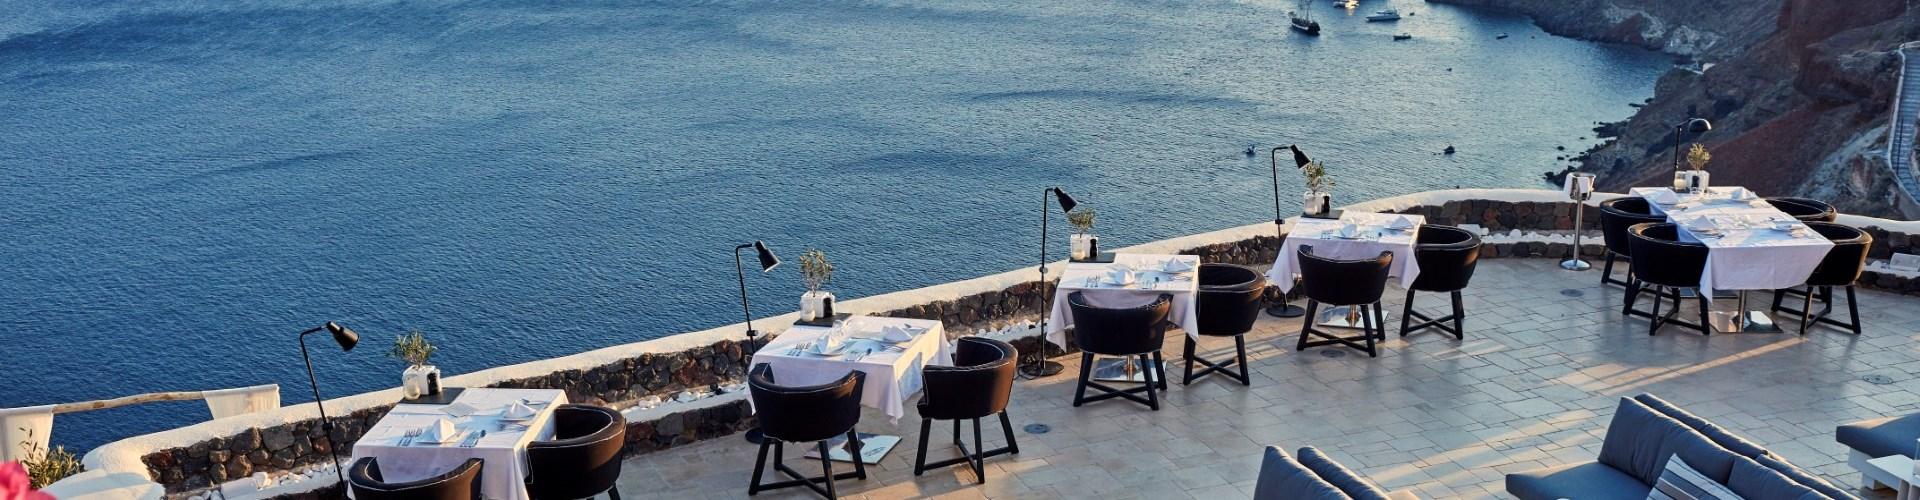 Petra Restaurant - Restaurants - Santorini